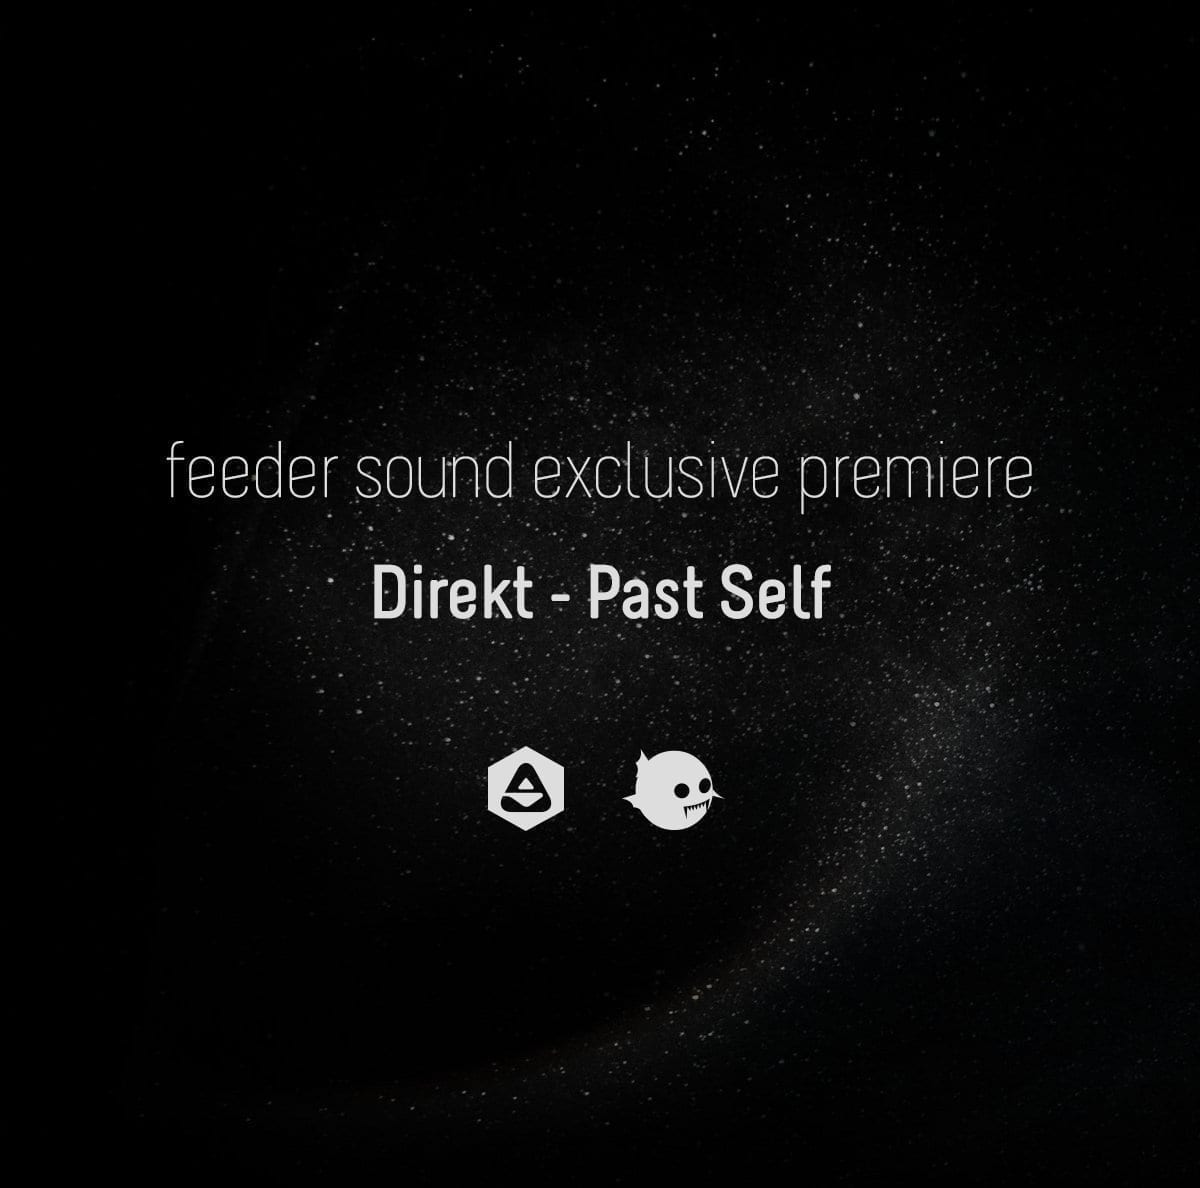 direkt - past self 01